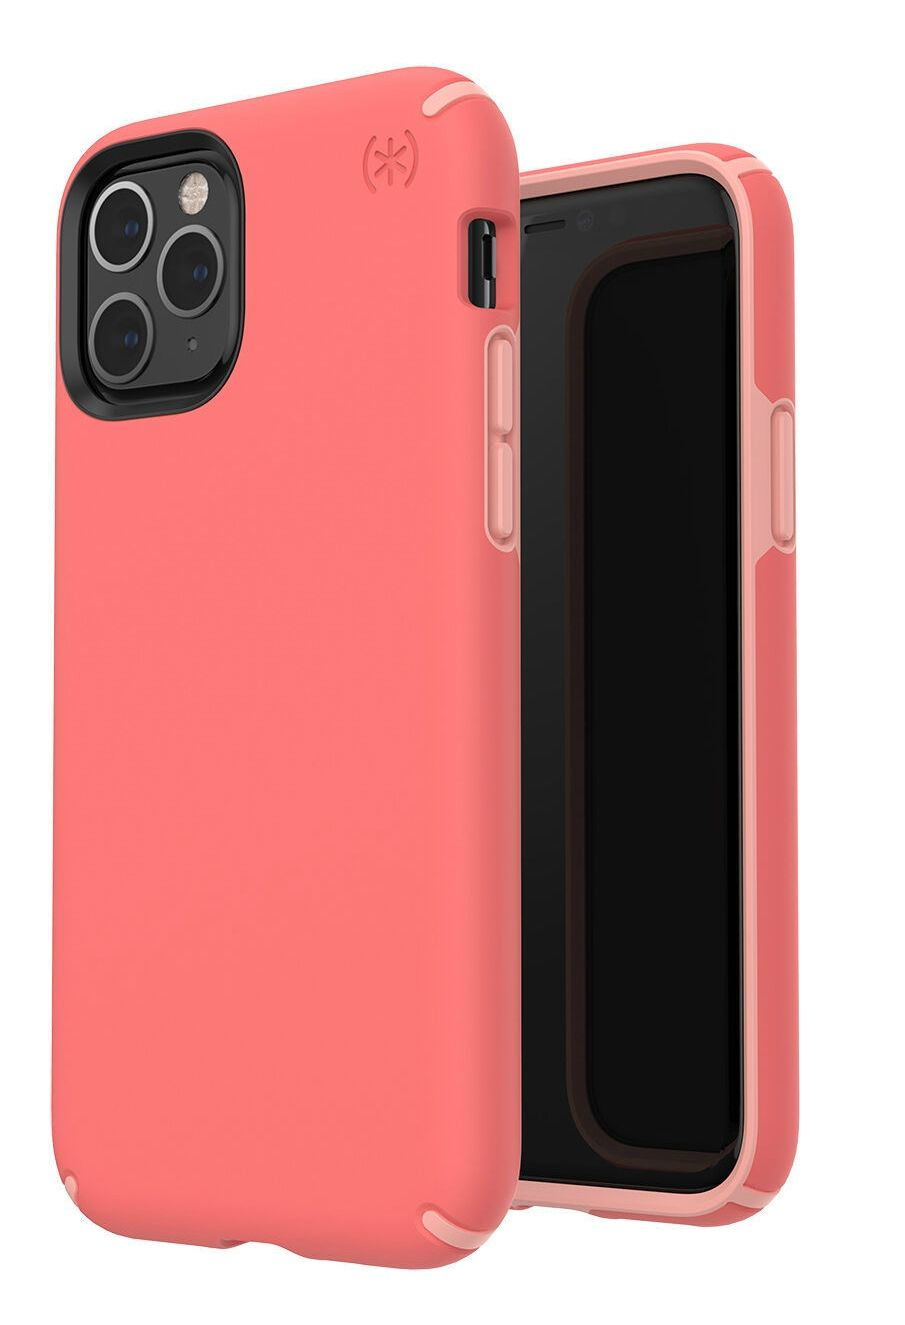 Калъф Speck - Presidio Pro, за iPhone 11 Pro, parrot pink/chiffon pink - 1